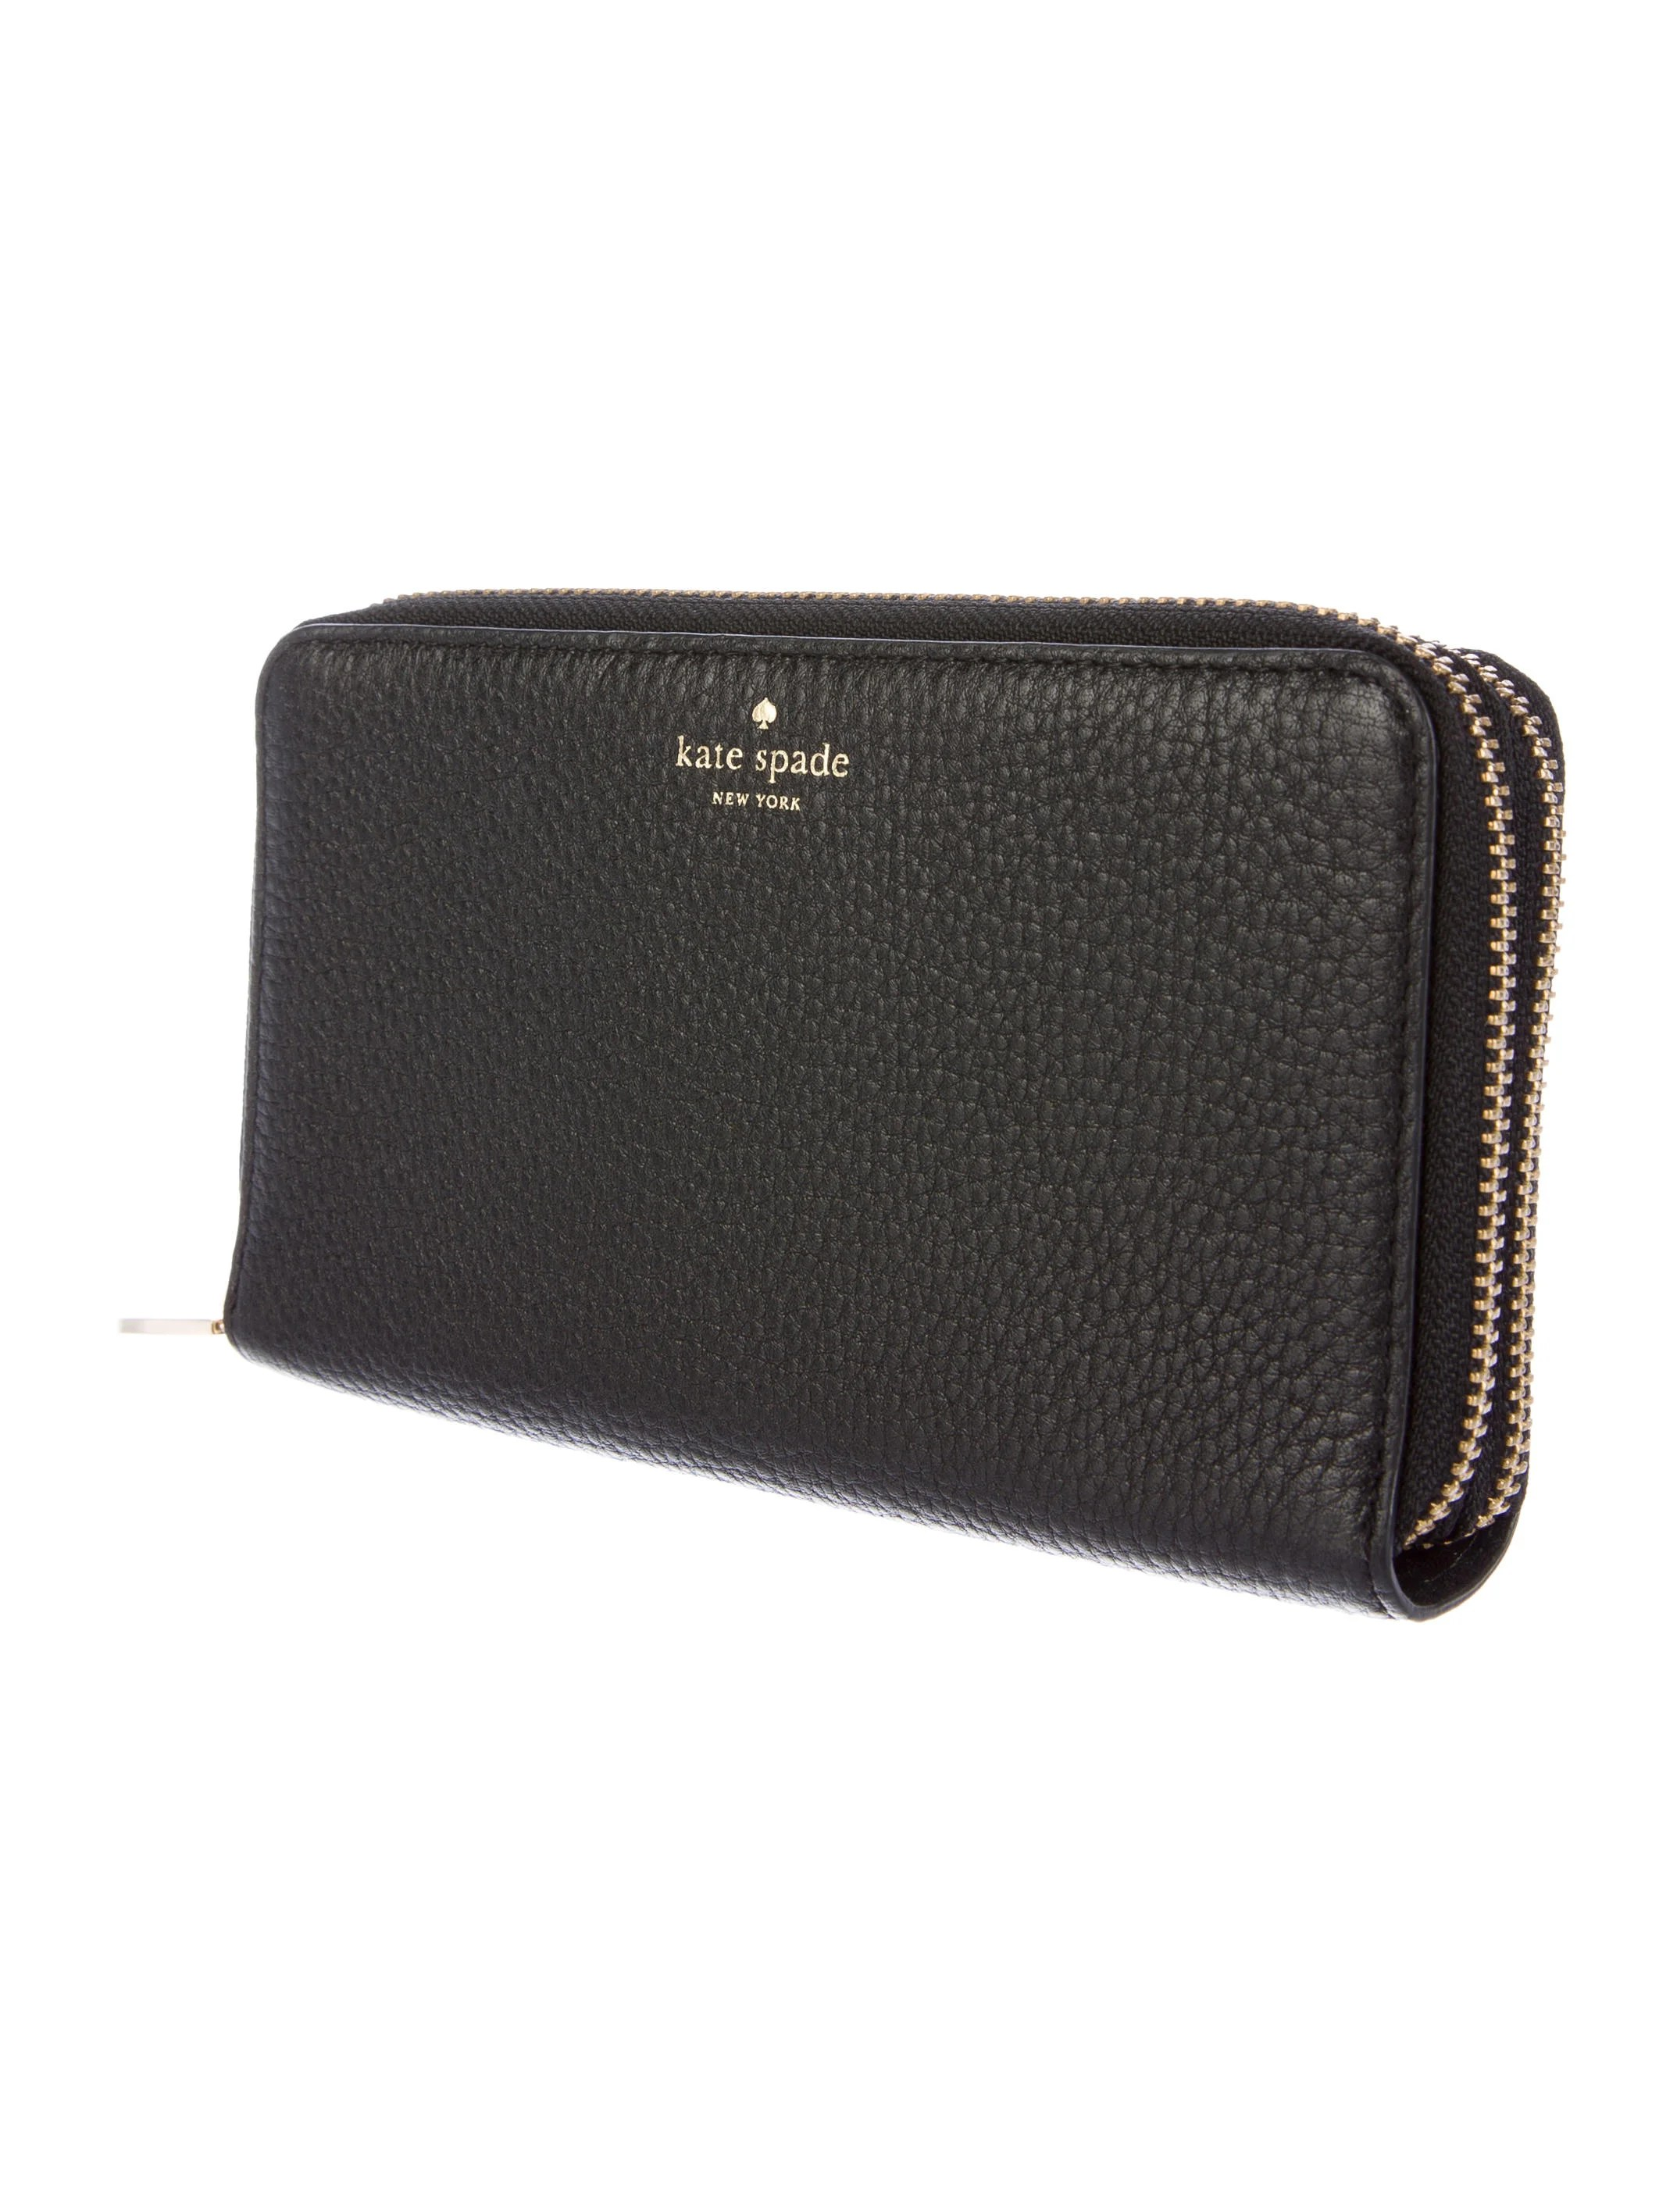 Kate Spade New York Grey Street Tiera Clutch Wallet - Handbags - WKA53182   The RealReal